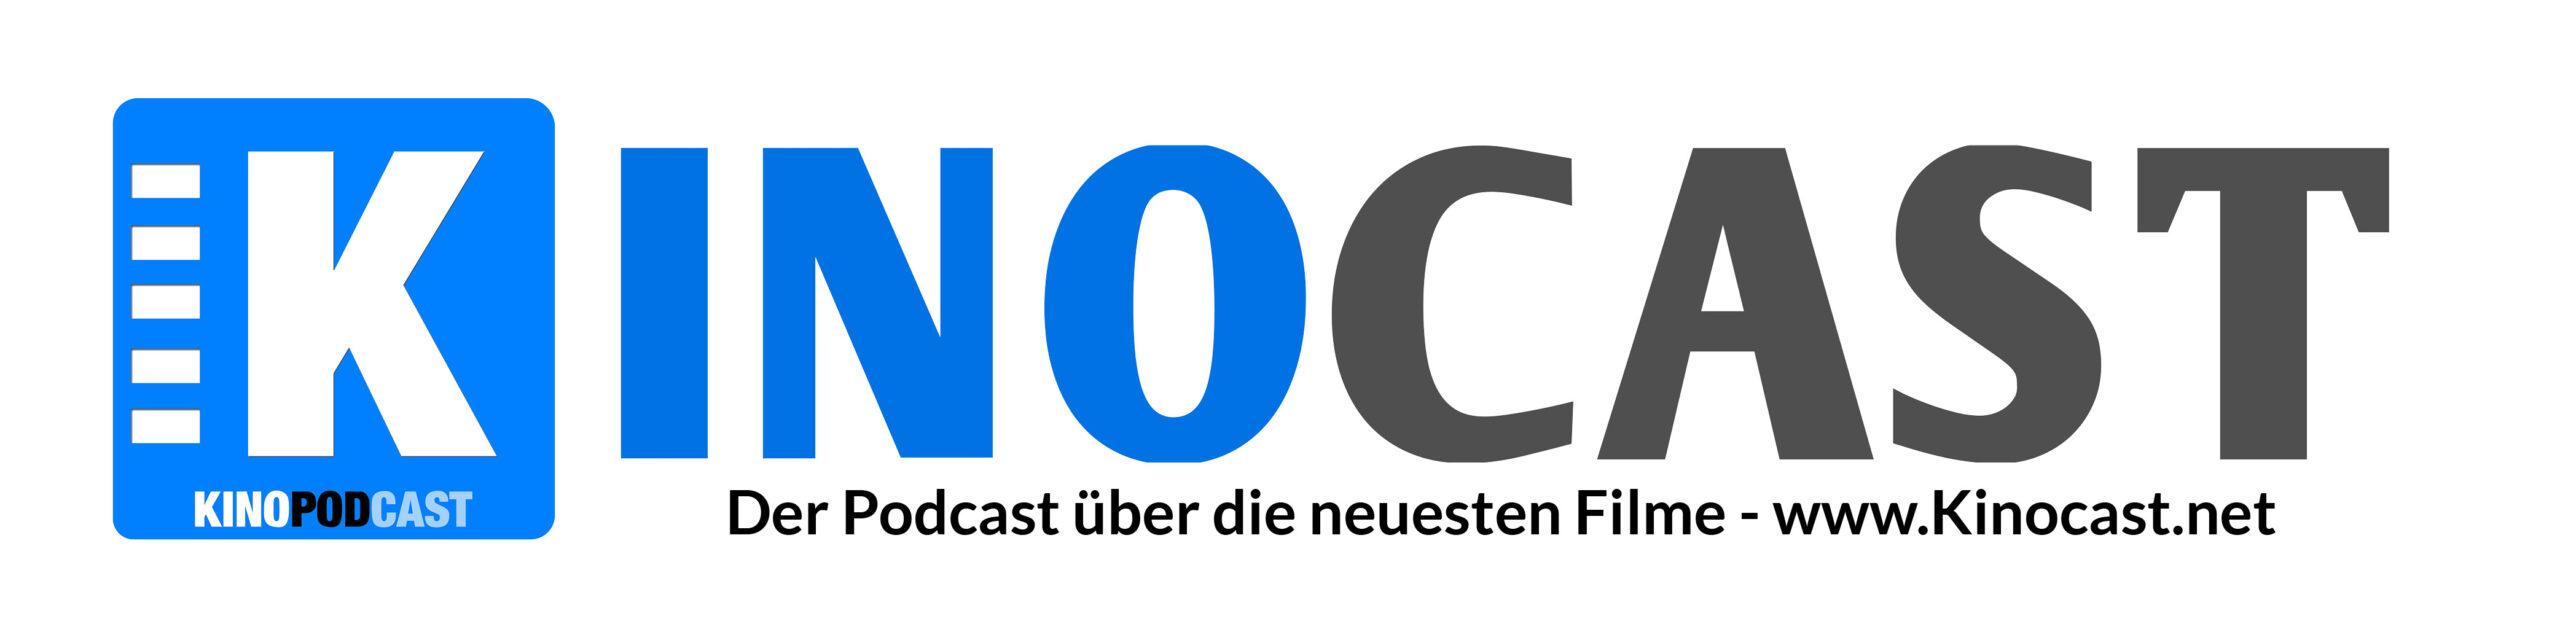 Kinocast Logo quer low Res